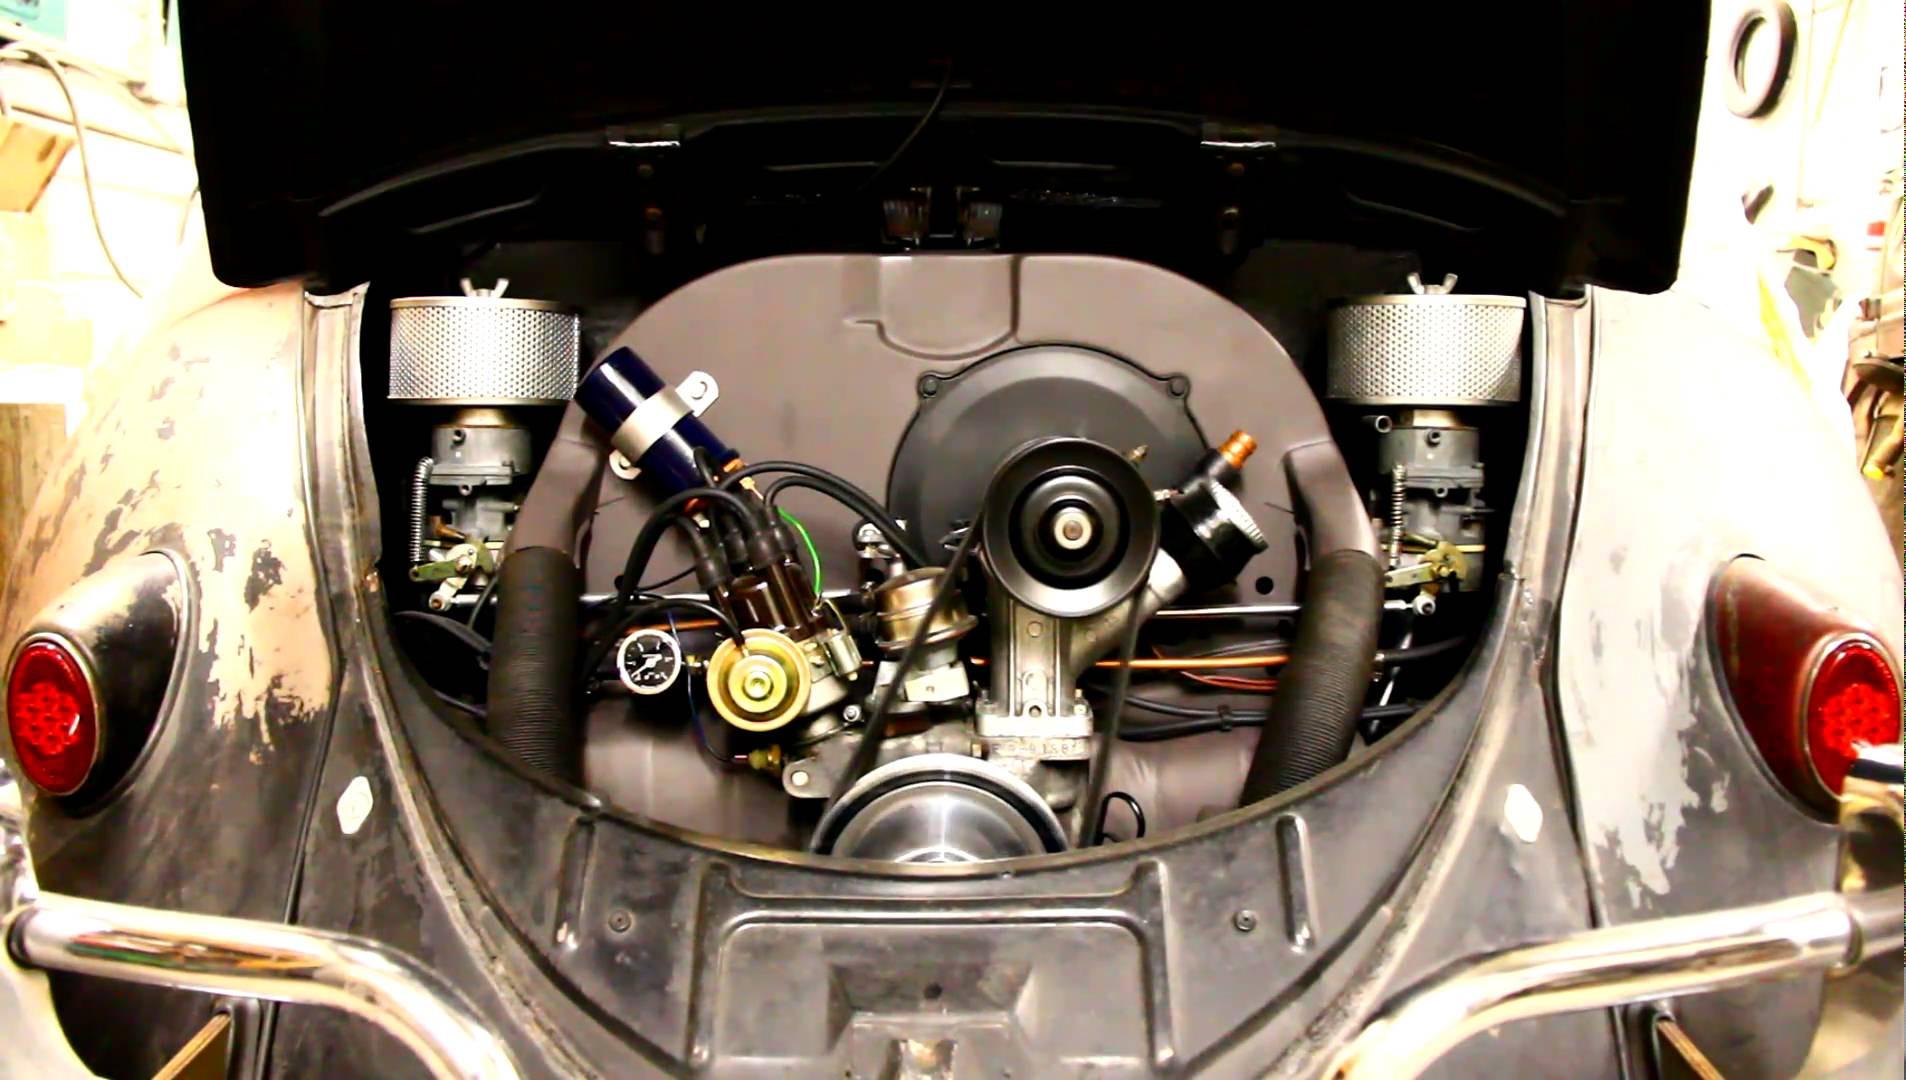 Ms 0280 1970 Vw Beetle Engine Diagram Schematic Wiring